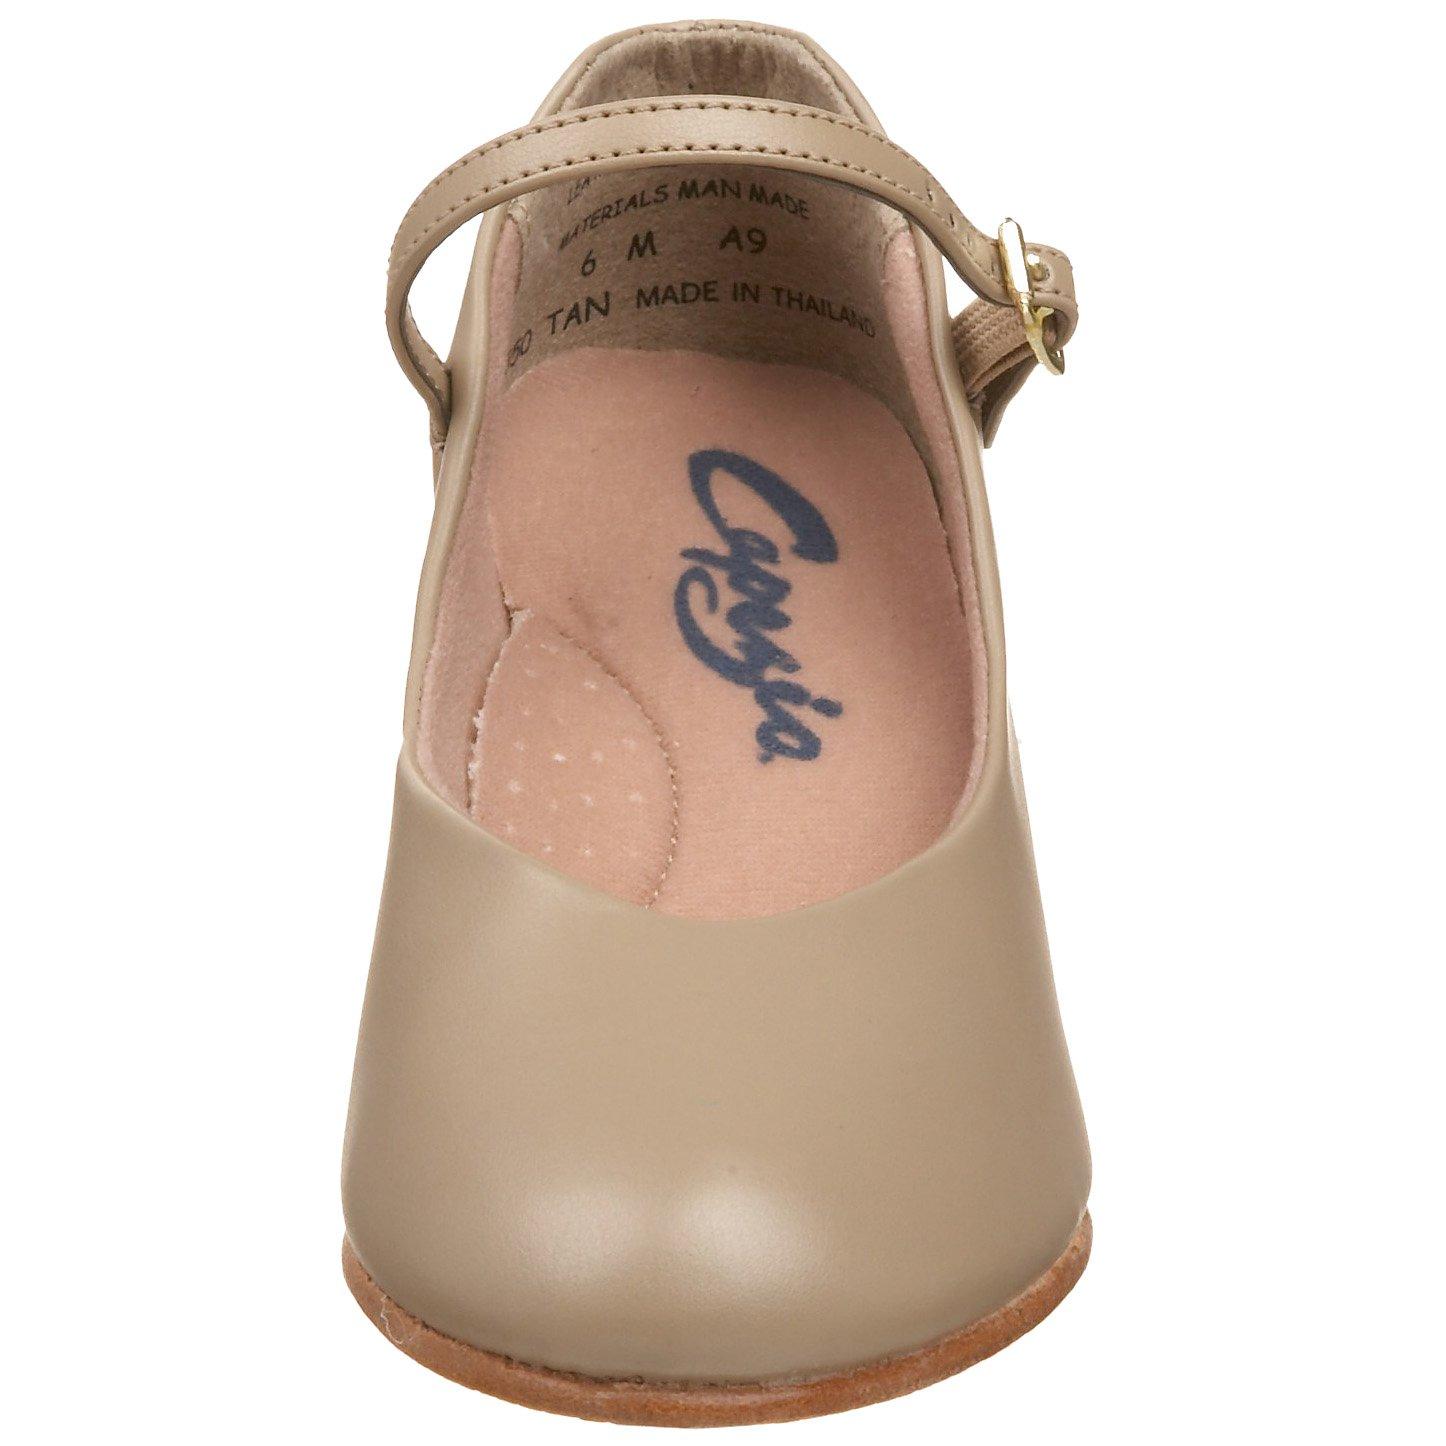 Capezio 550 Tan 10 Junior Footlight B0002RRMZ2 10 Tan B(M) US|Tan 4ff4ca